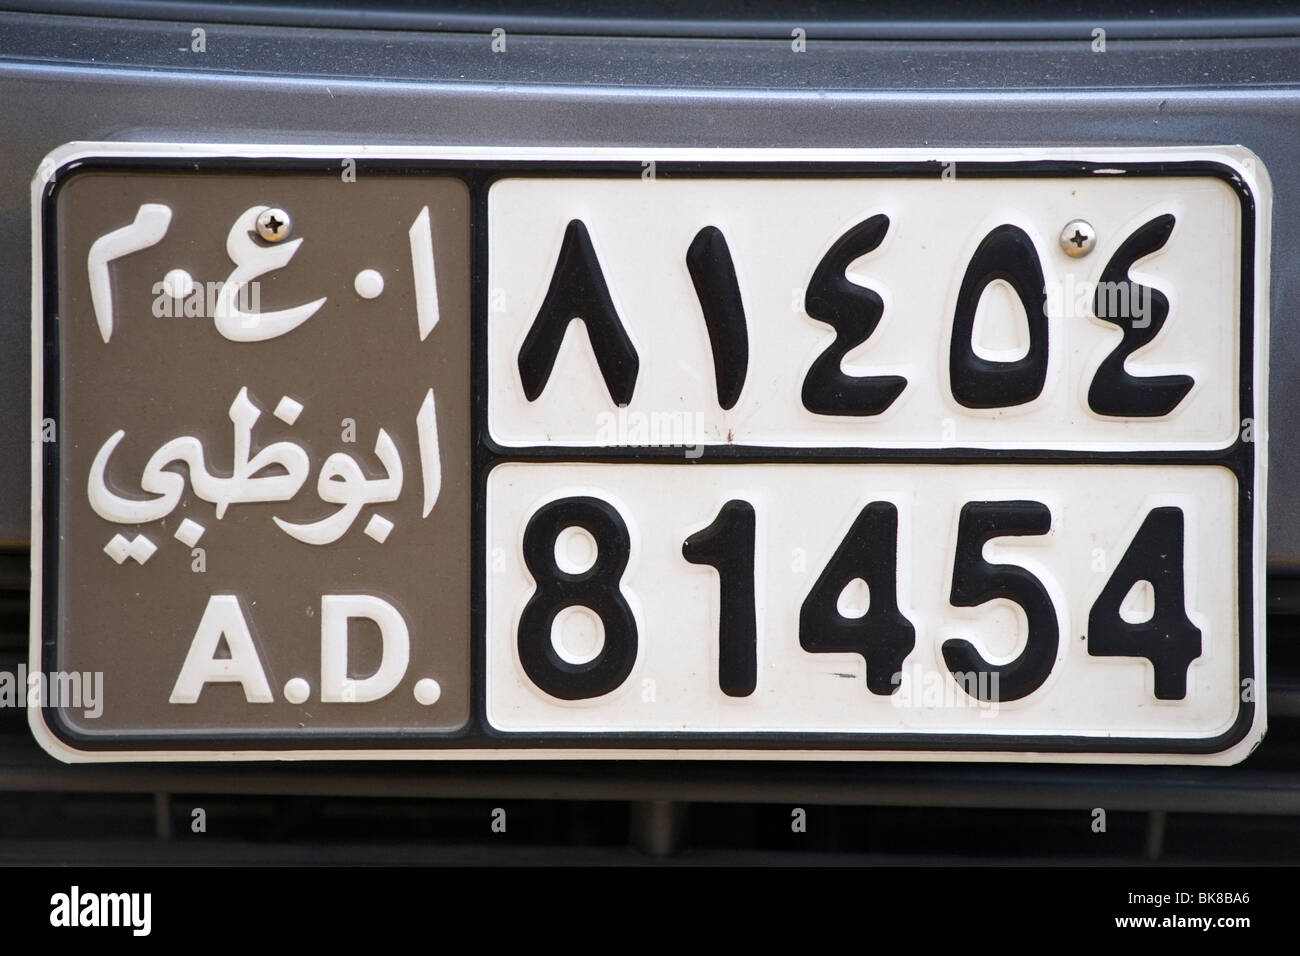 Abu Dhabi car registration plate. - Stock Image